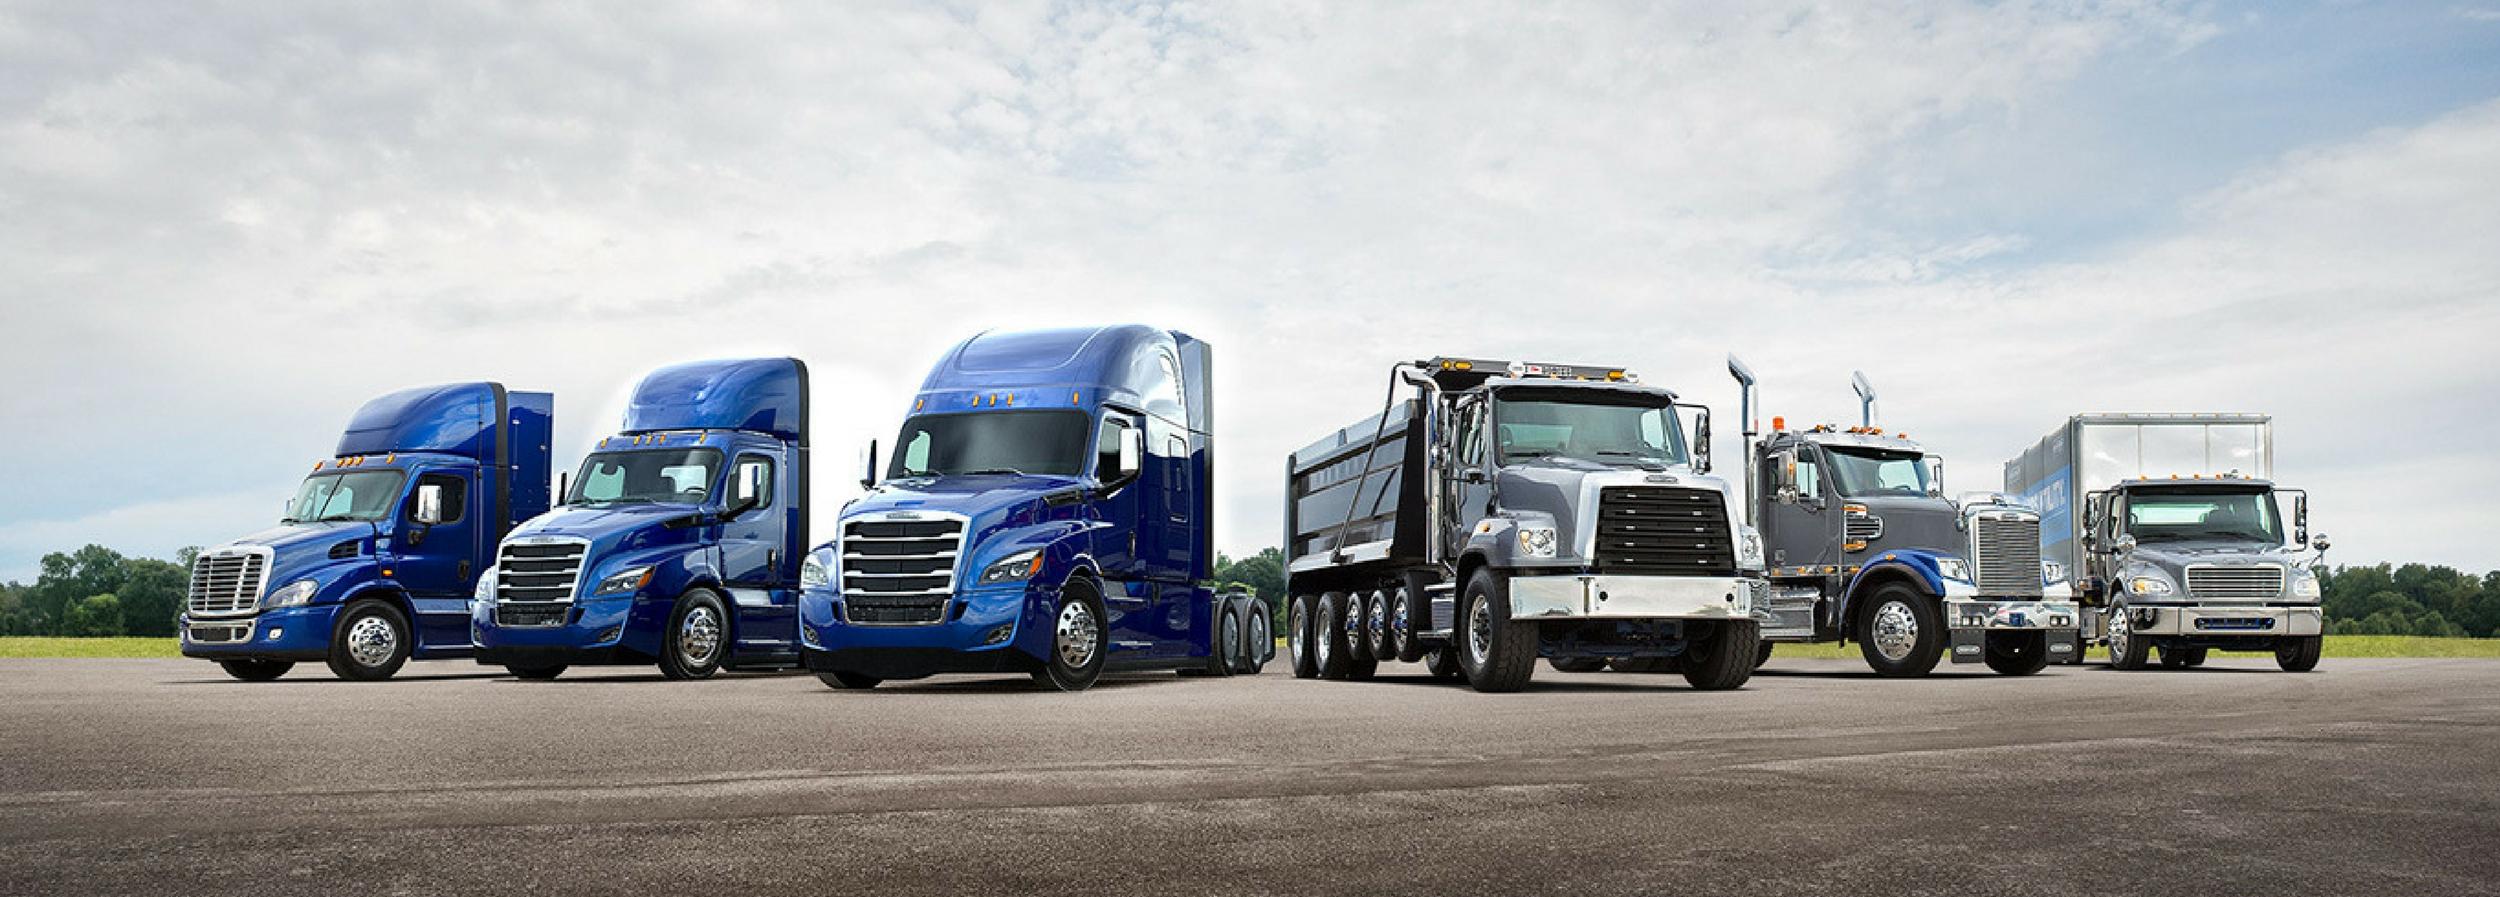 Freightliner Trucks Daimler Truck Wiring Diagrams 2